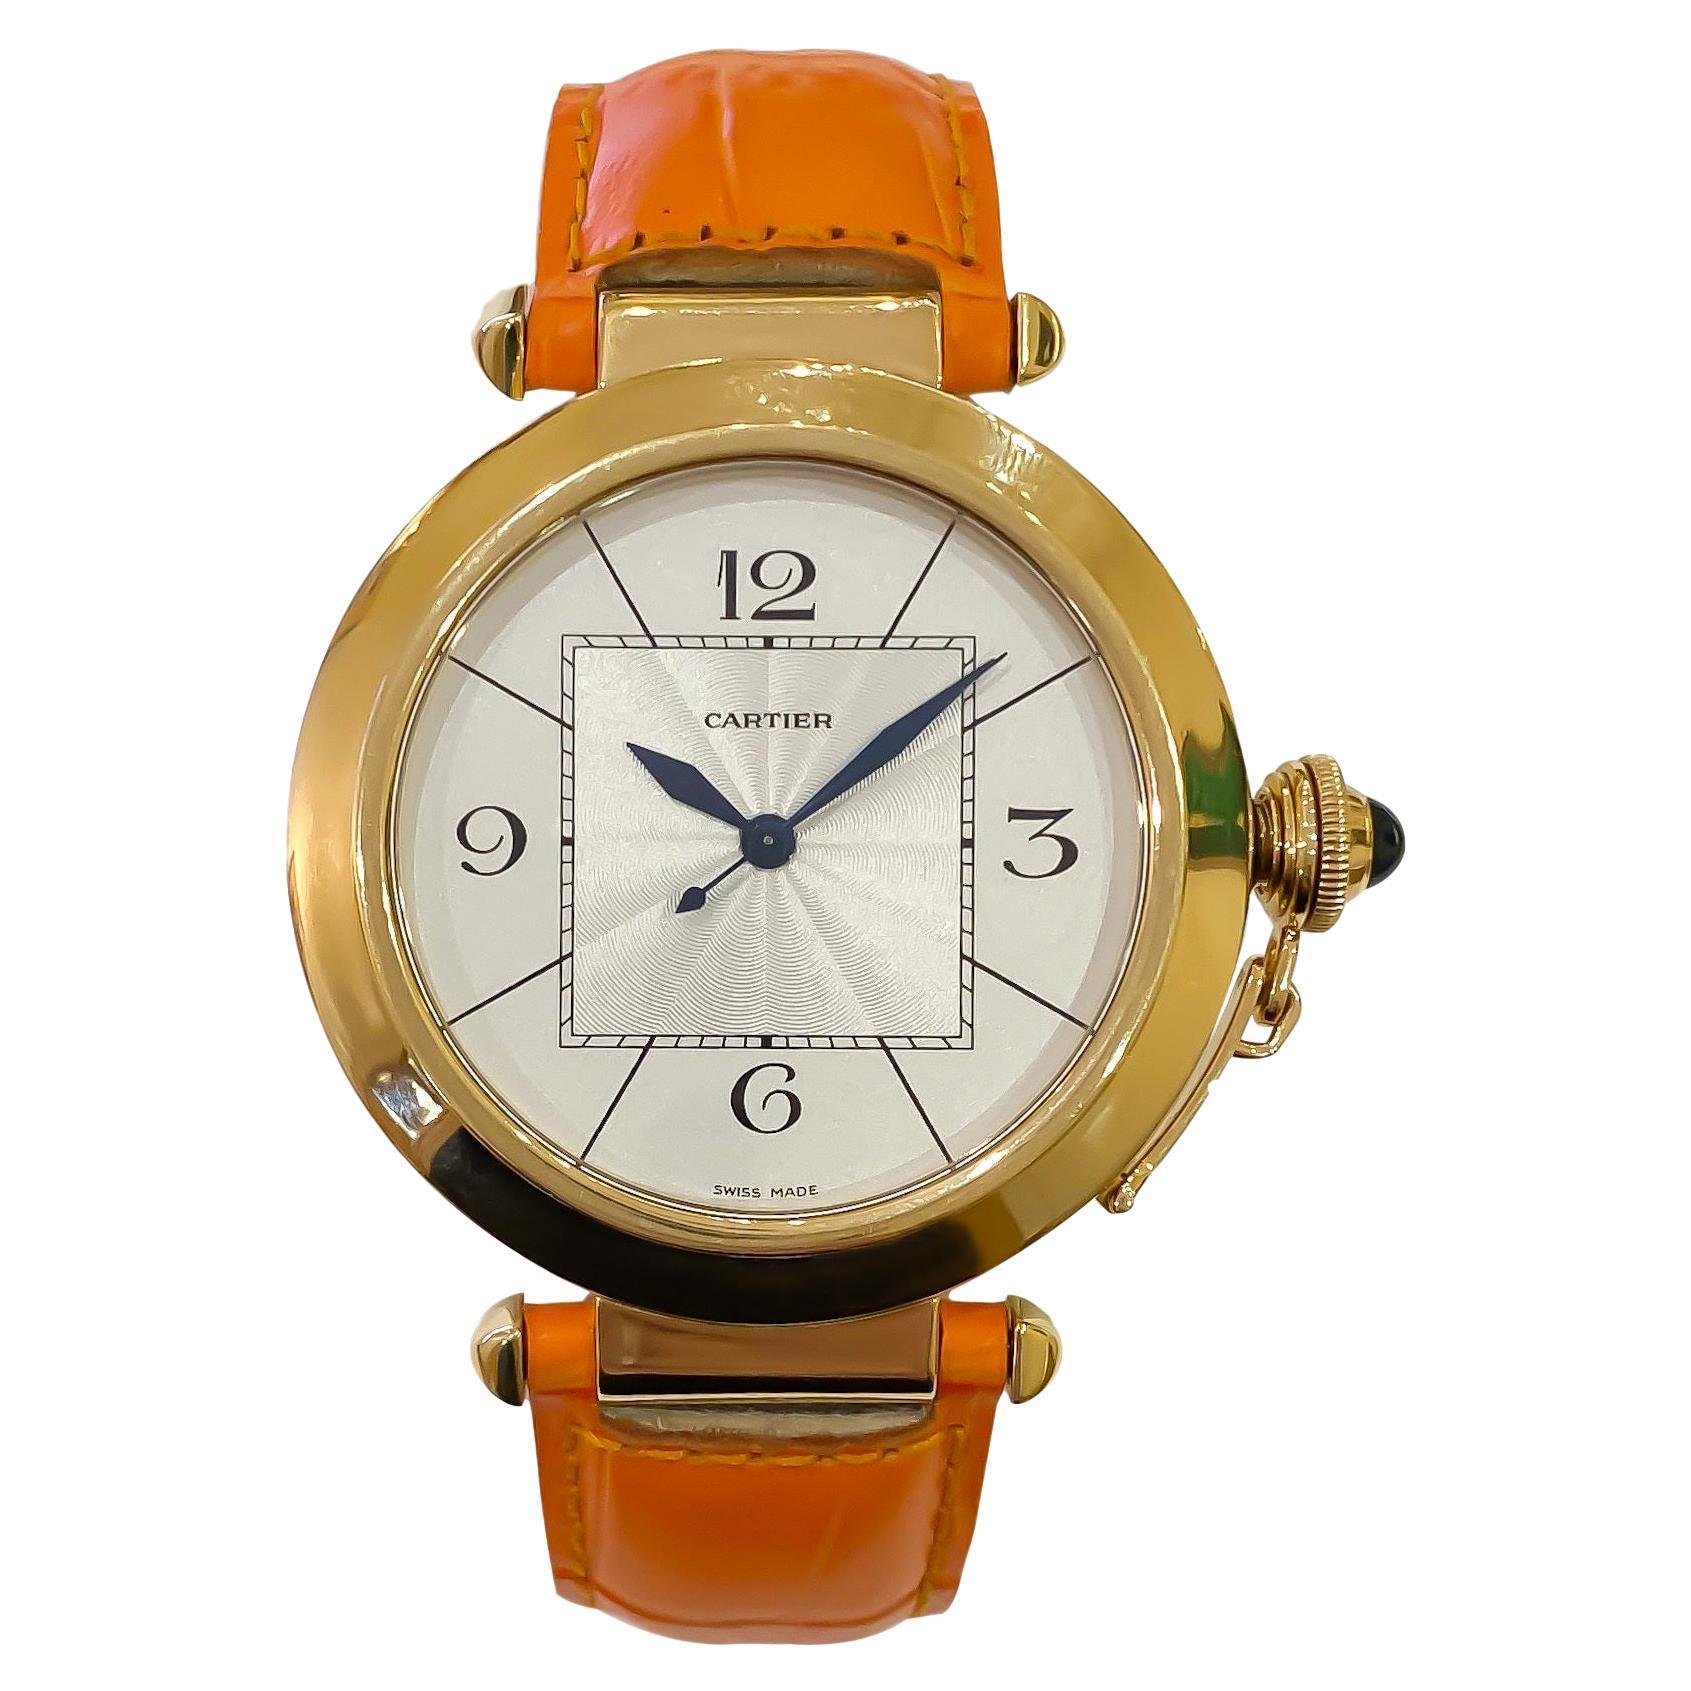 Cartier Large Pasha Automatic 18 Karat Yellow Gold Watch